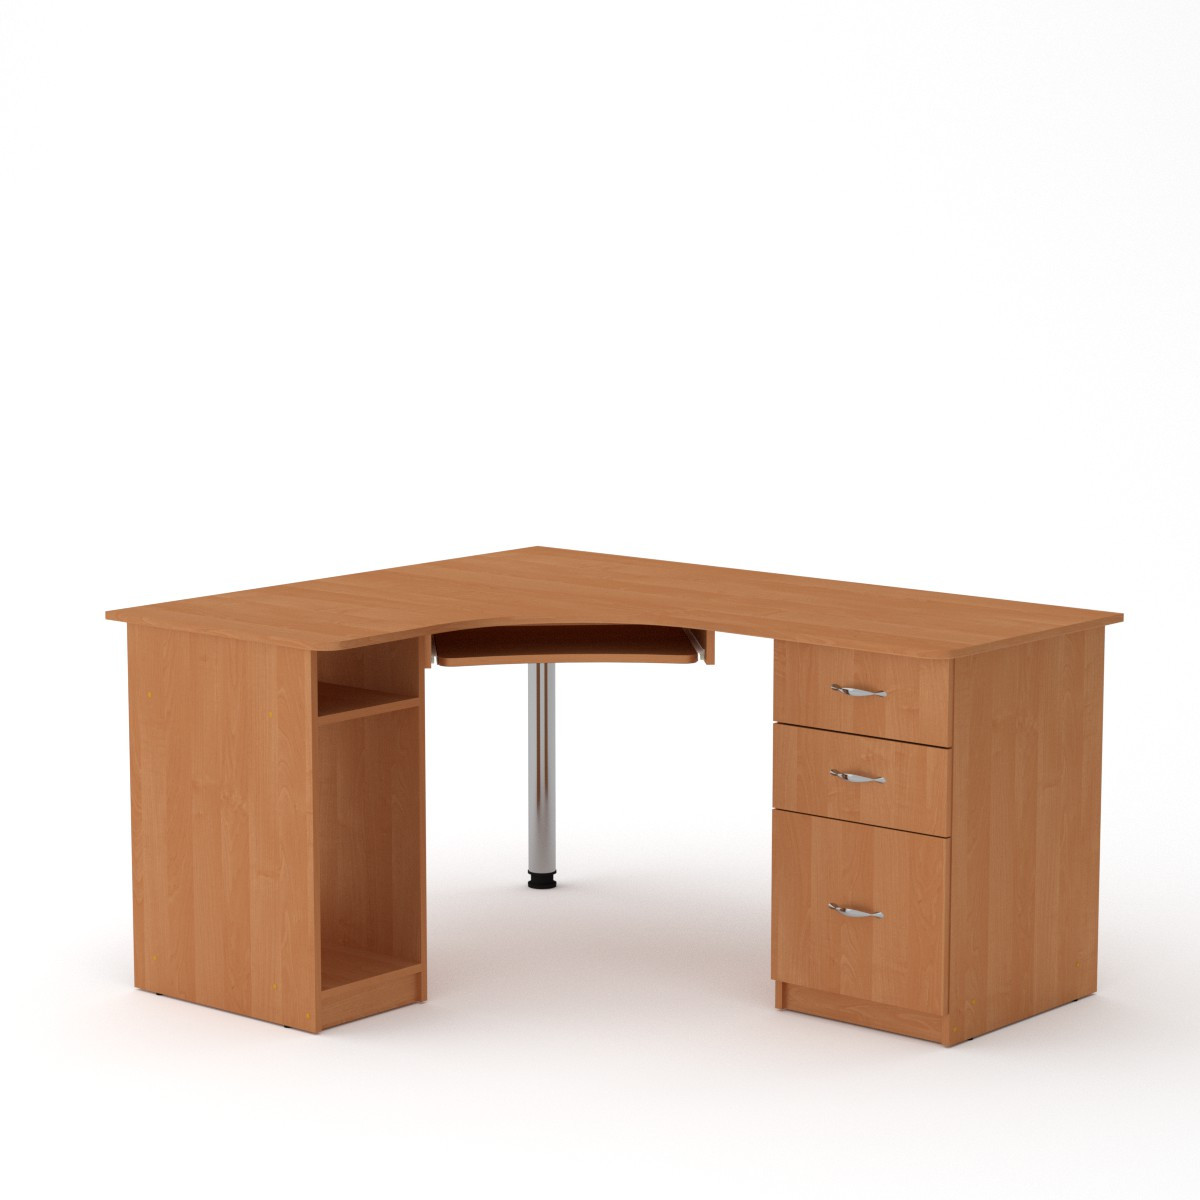 Стол компьютерный СУ-9 ольха Компанит (150х125х74 см)